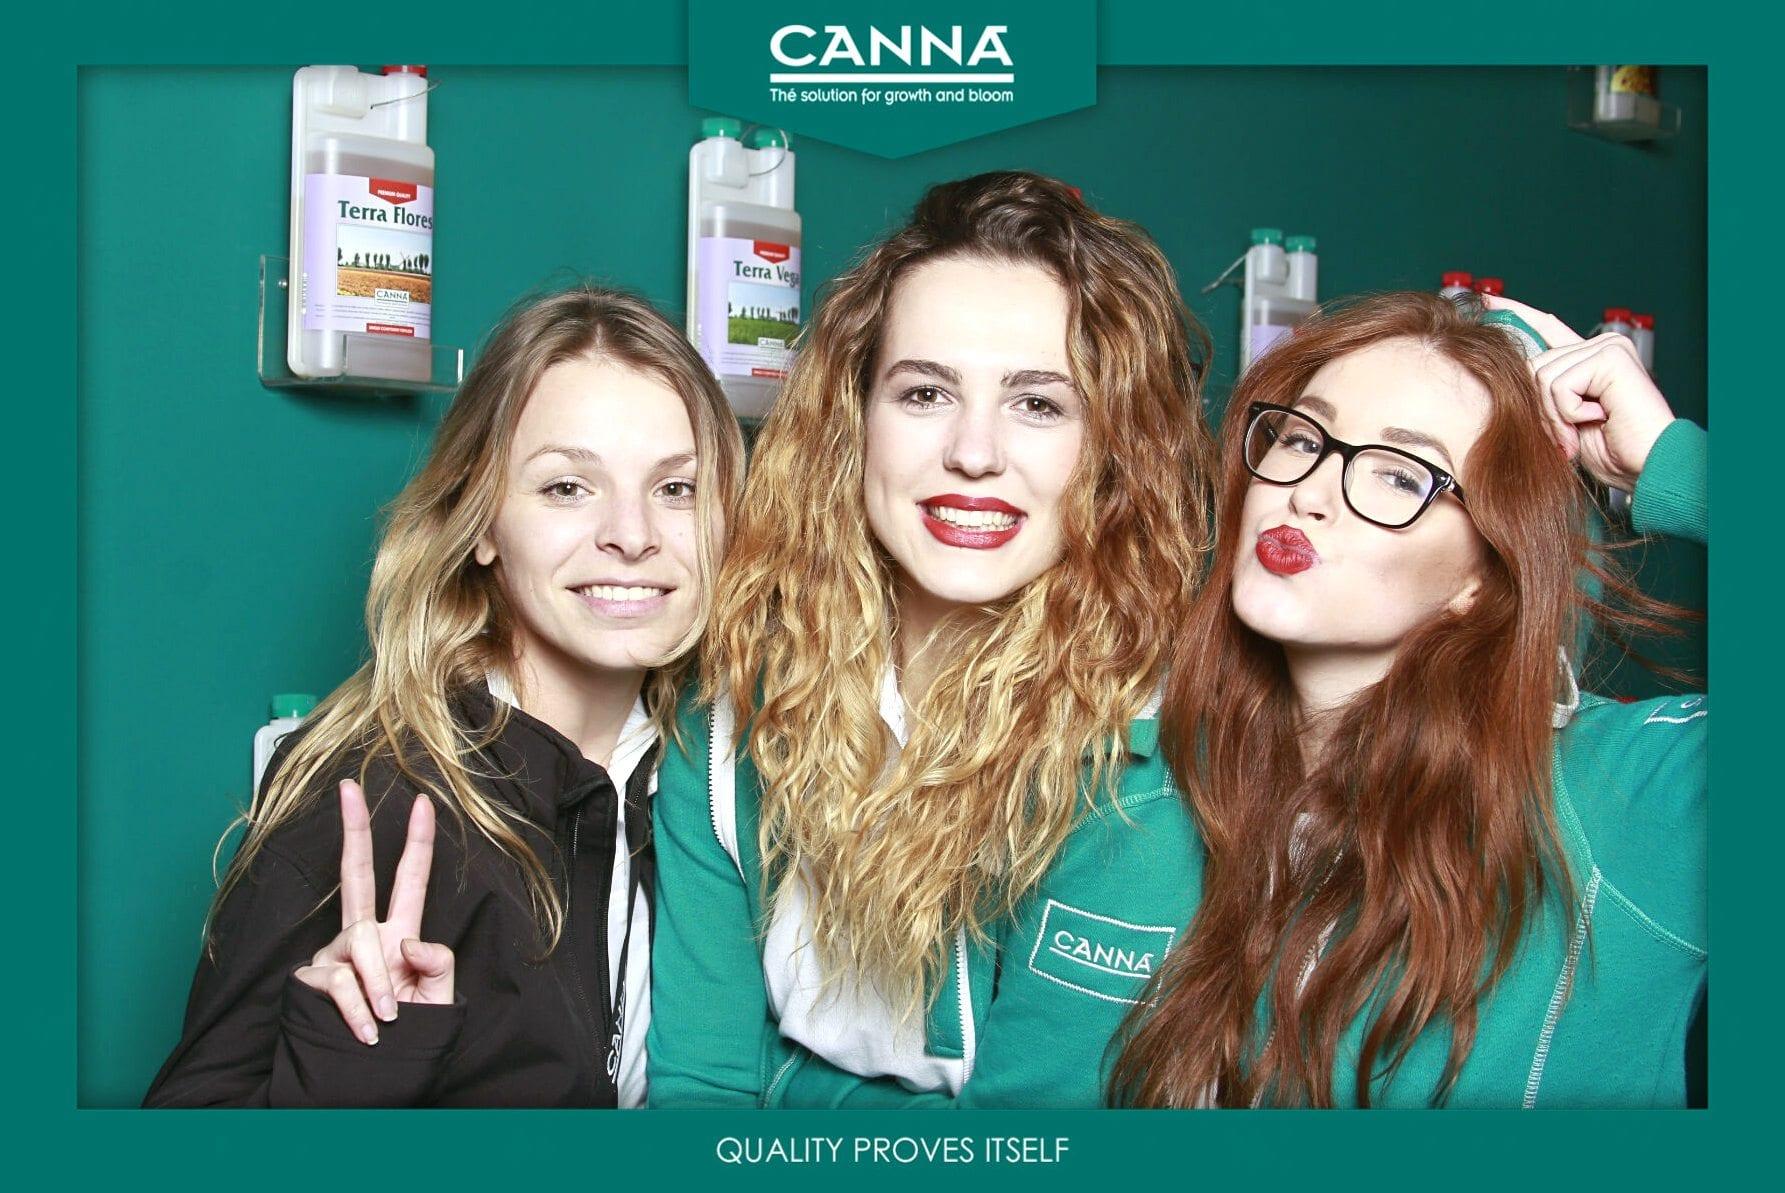 fotokoutek-canna-11-11-2016-155954